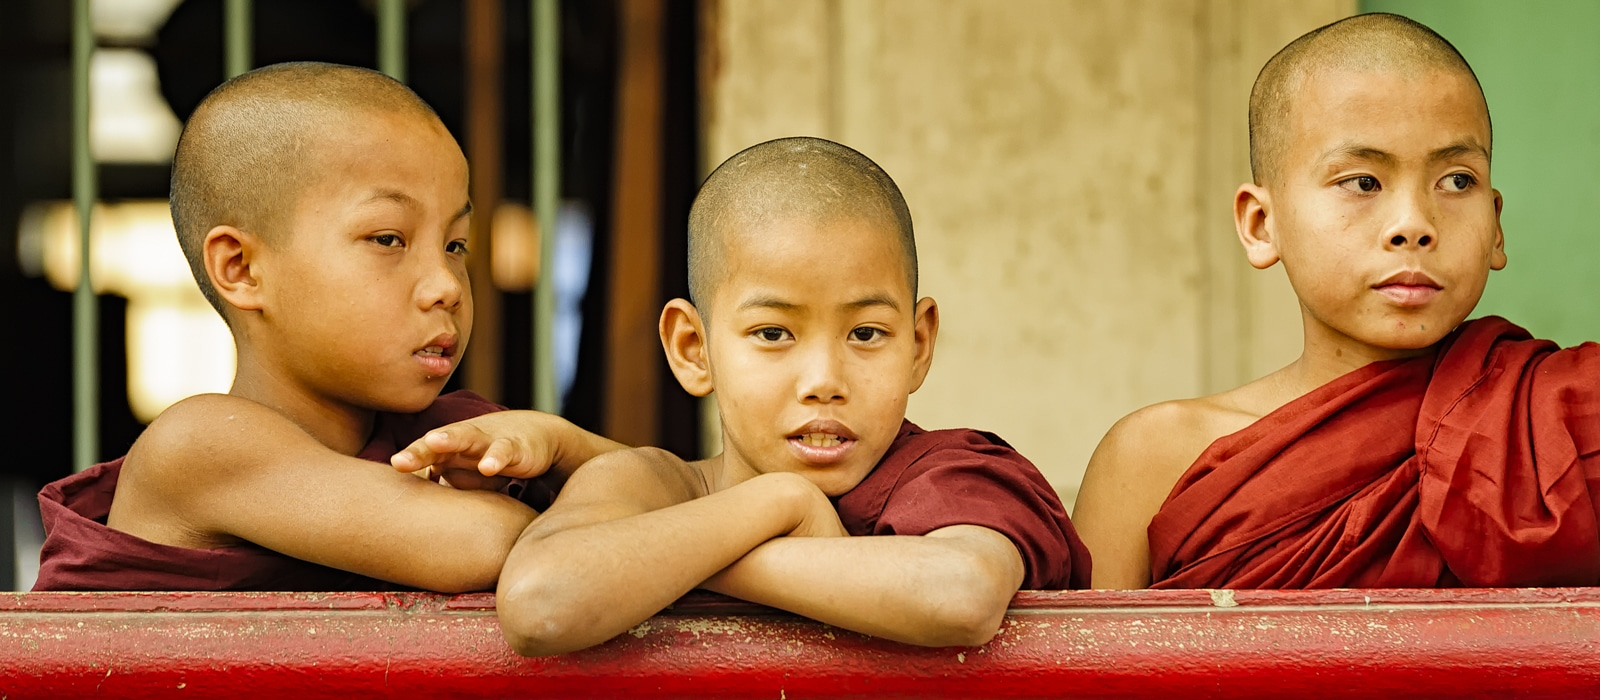 img-diapo-entete - Myanmar-1600x700-7.jpg